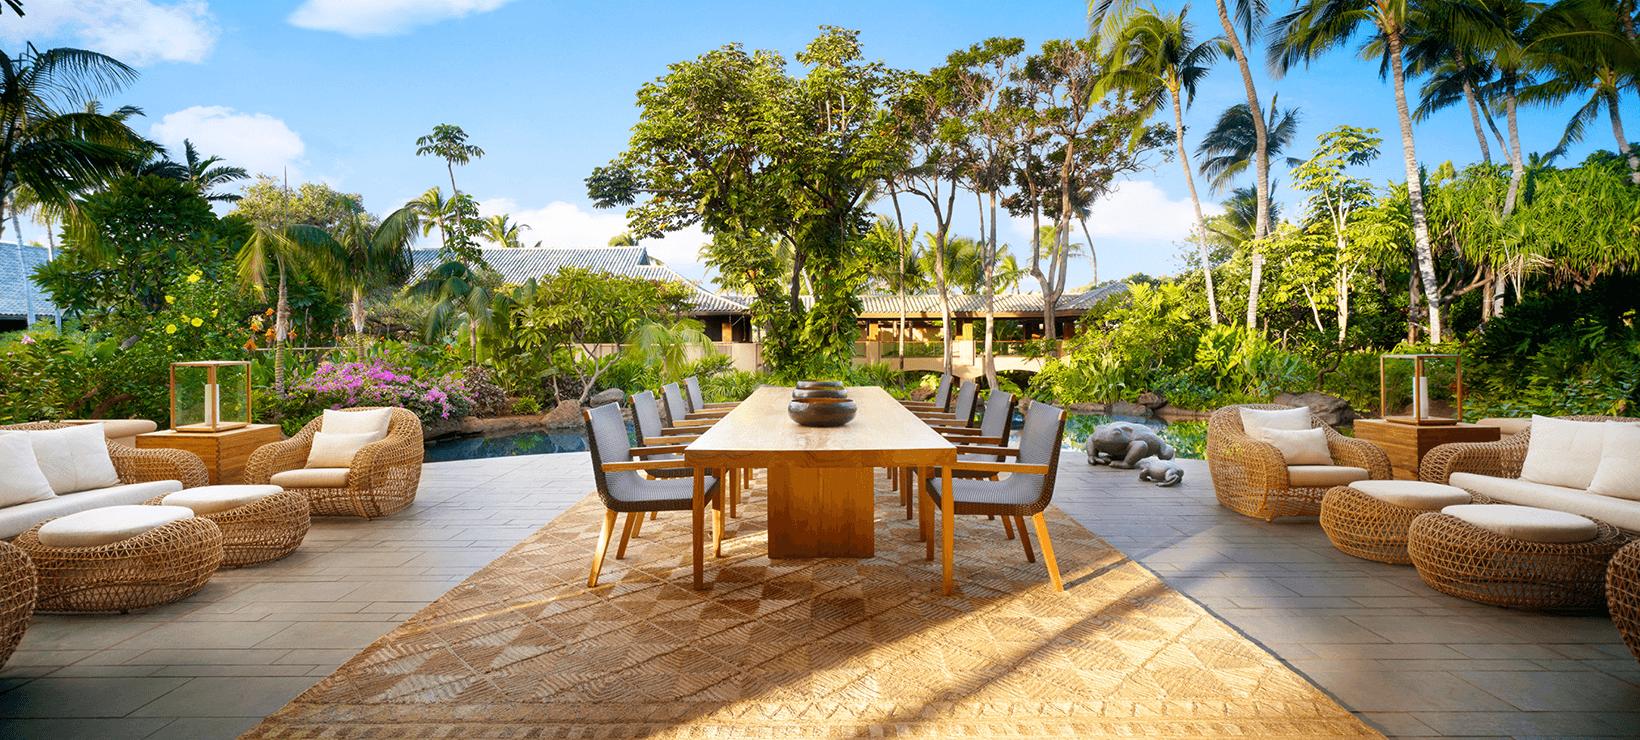 resort outdoor dining setting